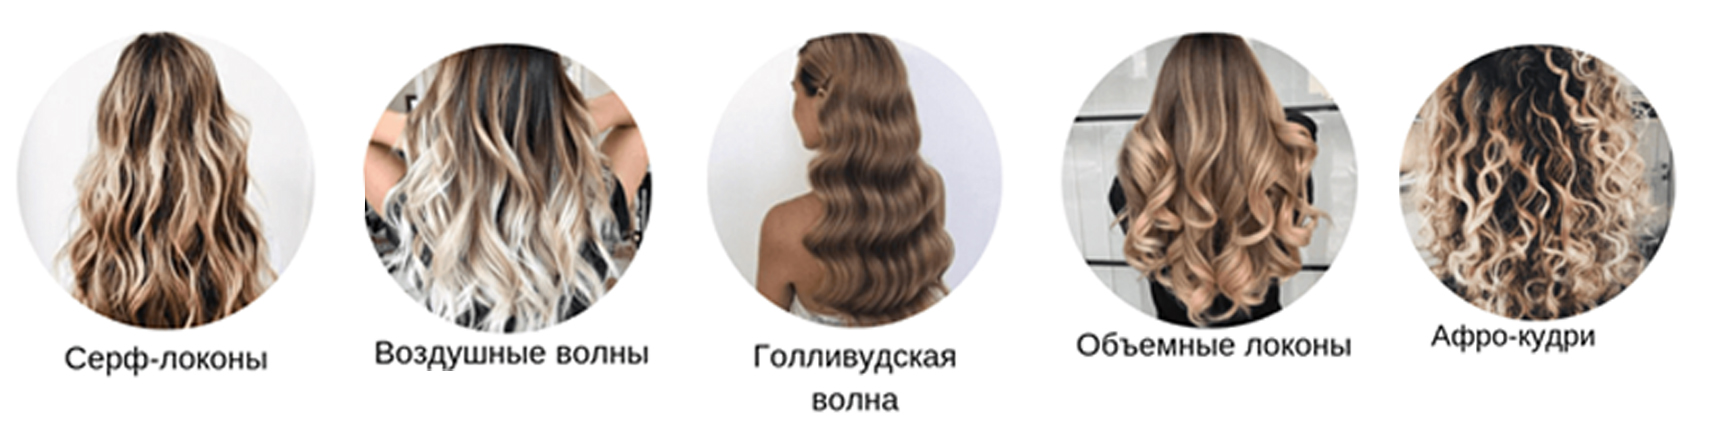 разновидности локонов